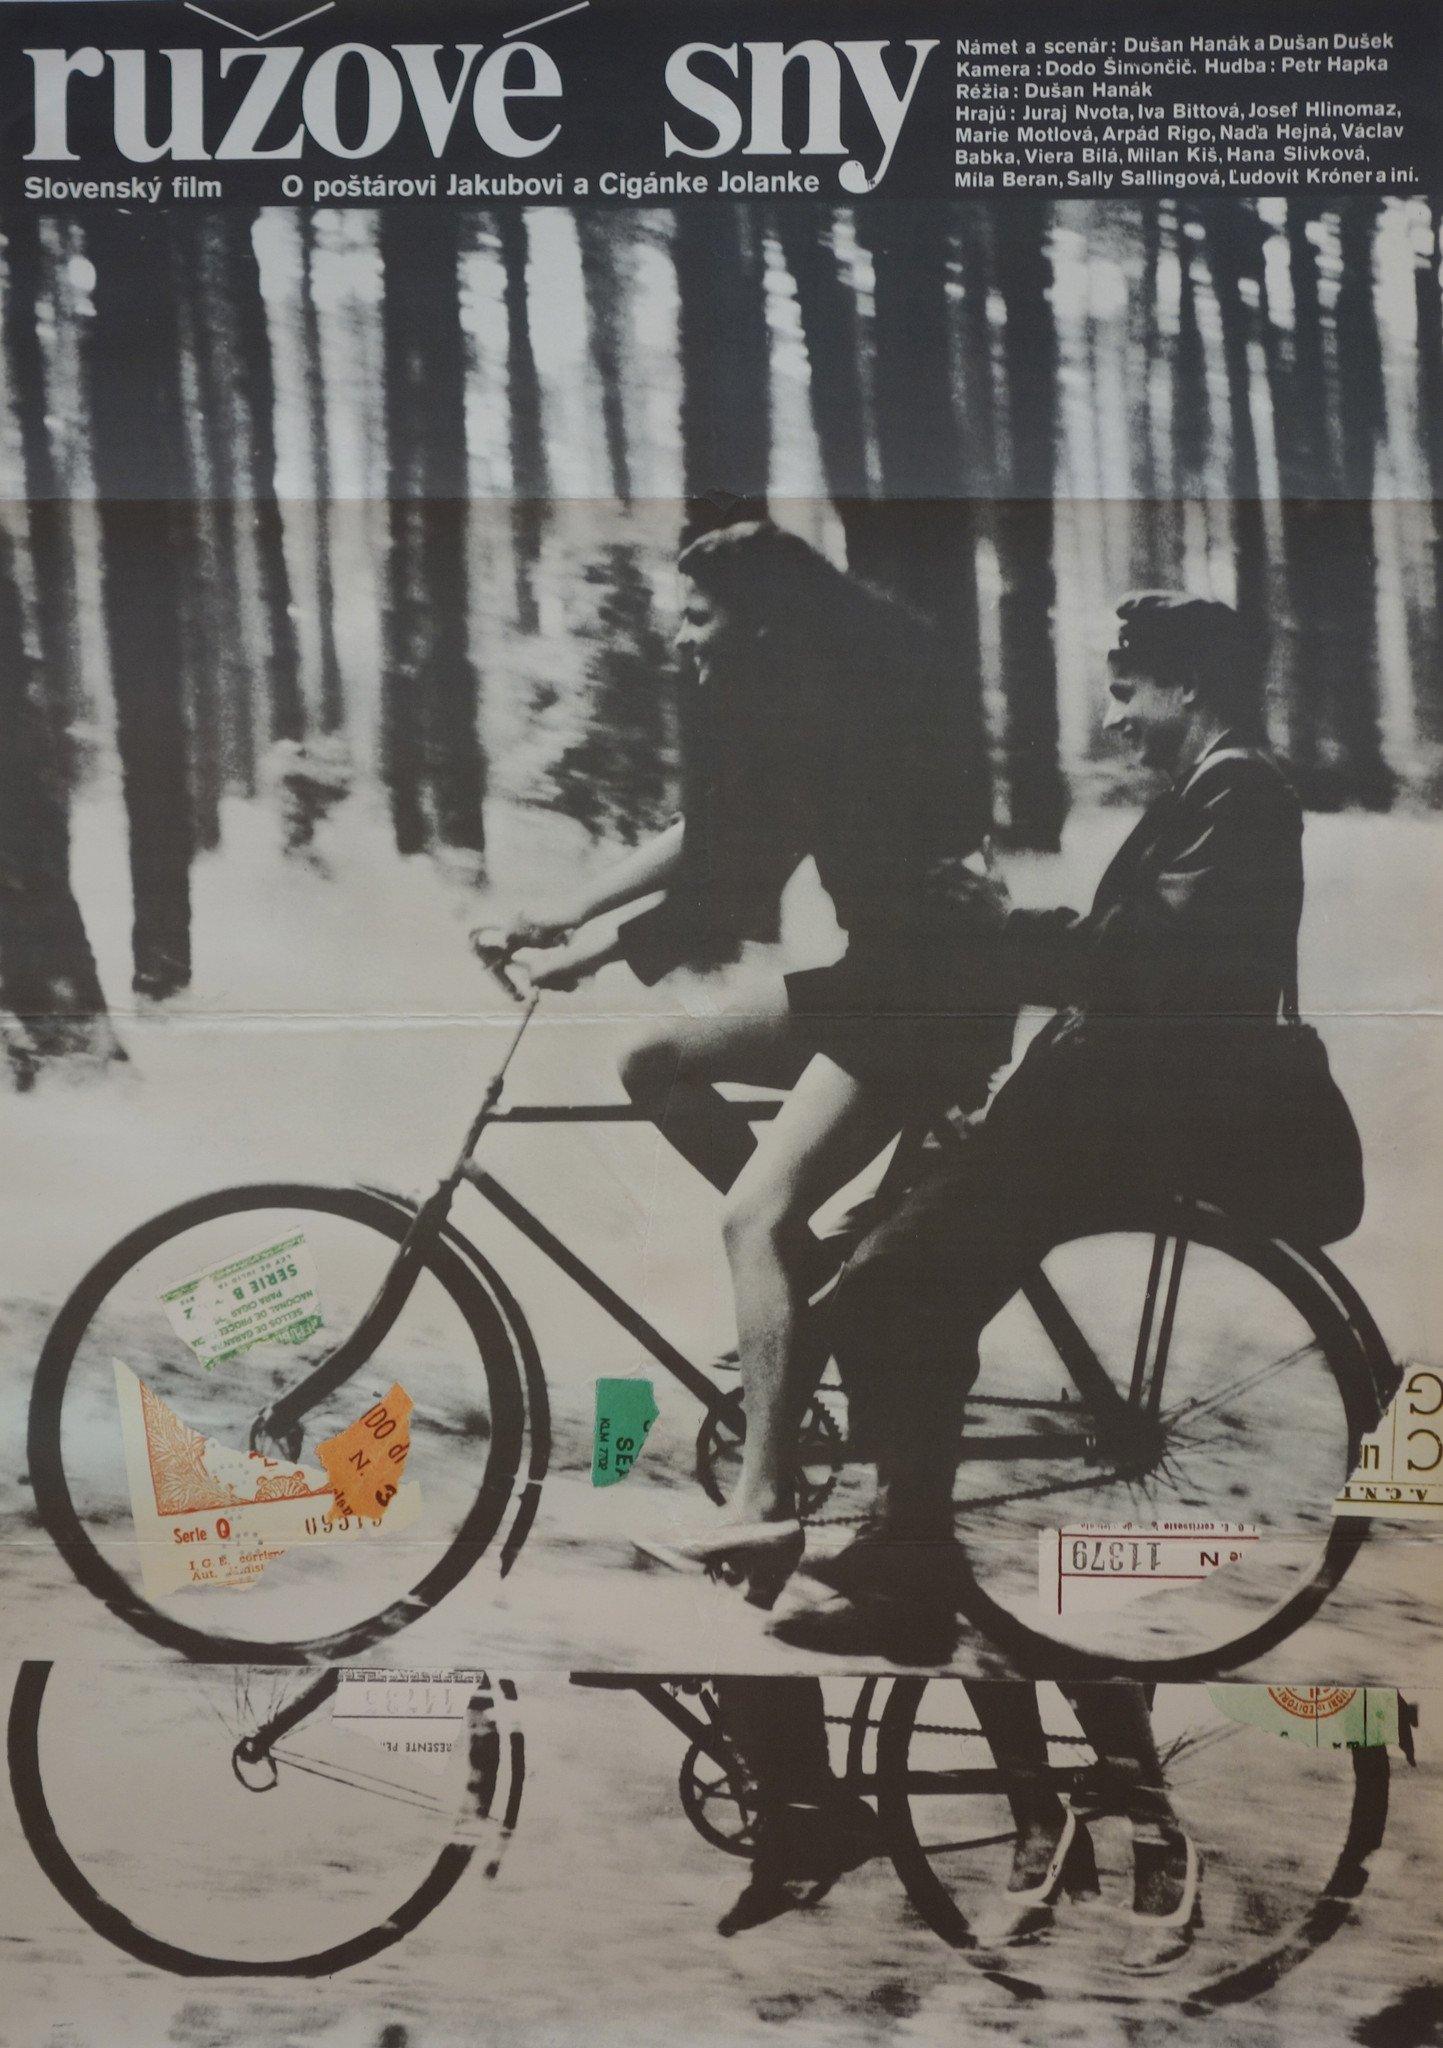 Розовые сны - Душан Ганак, 1976. Постер Милана Грыгара